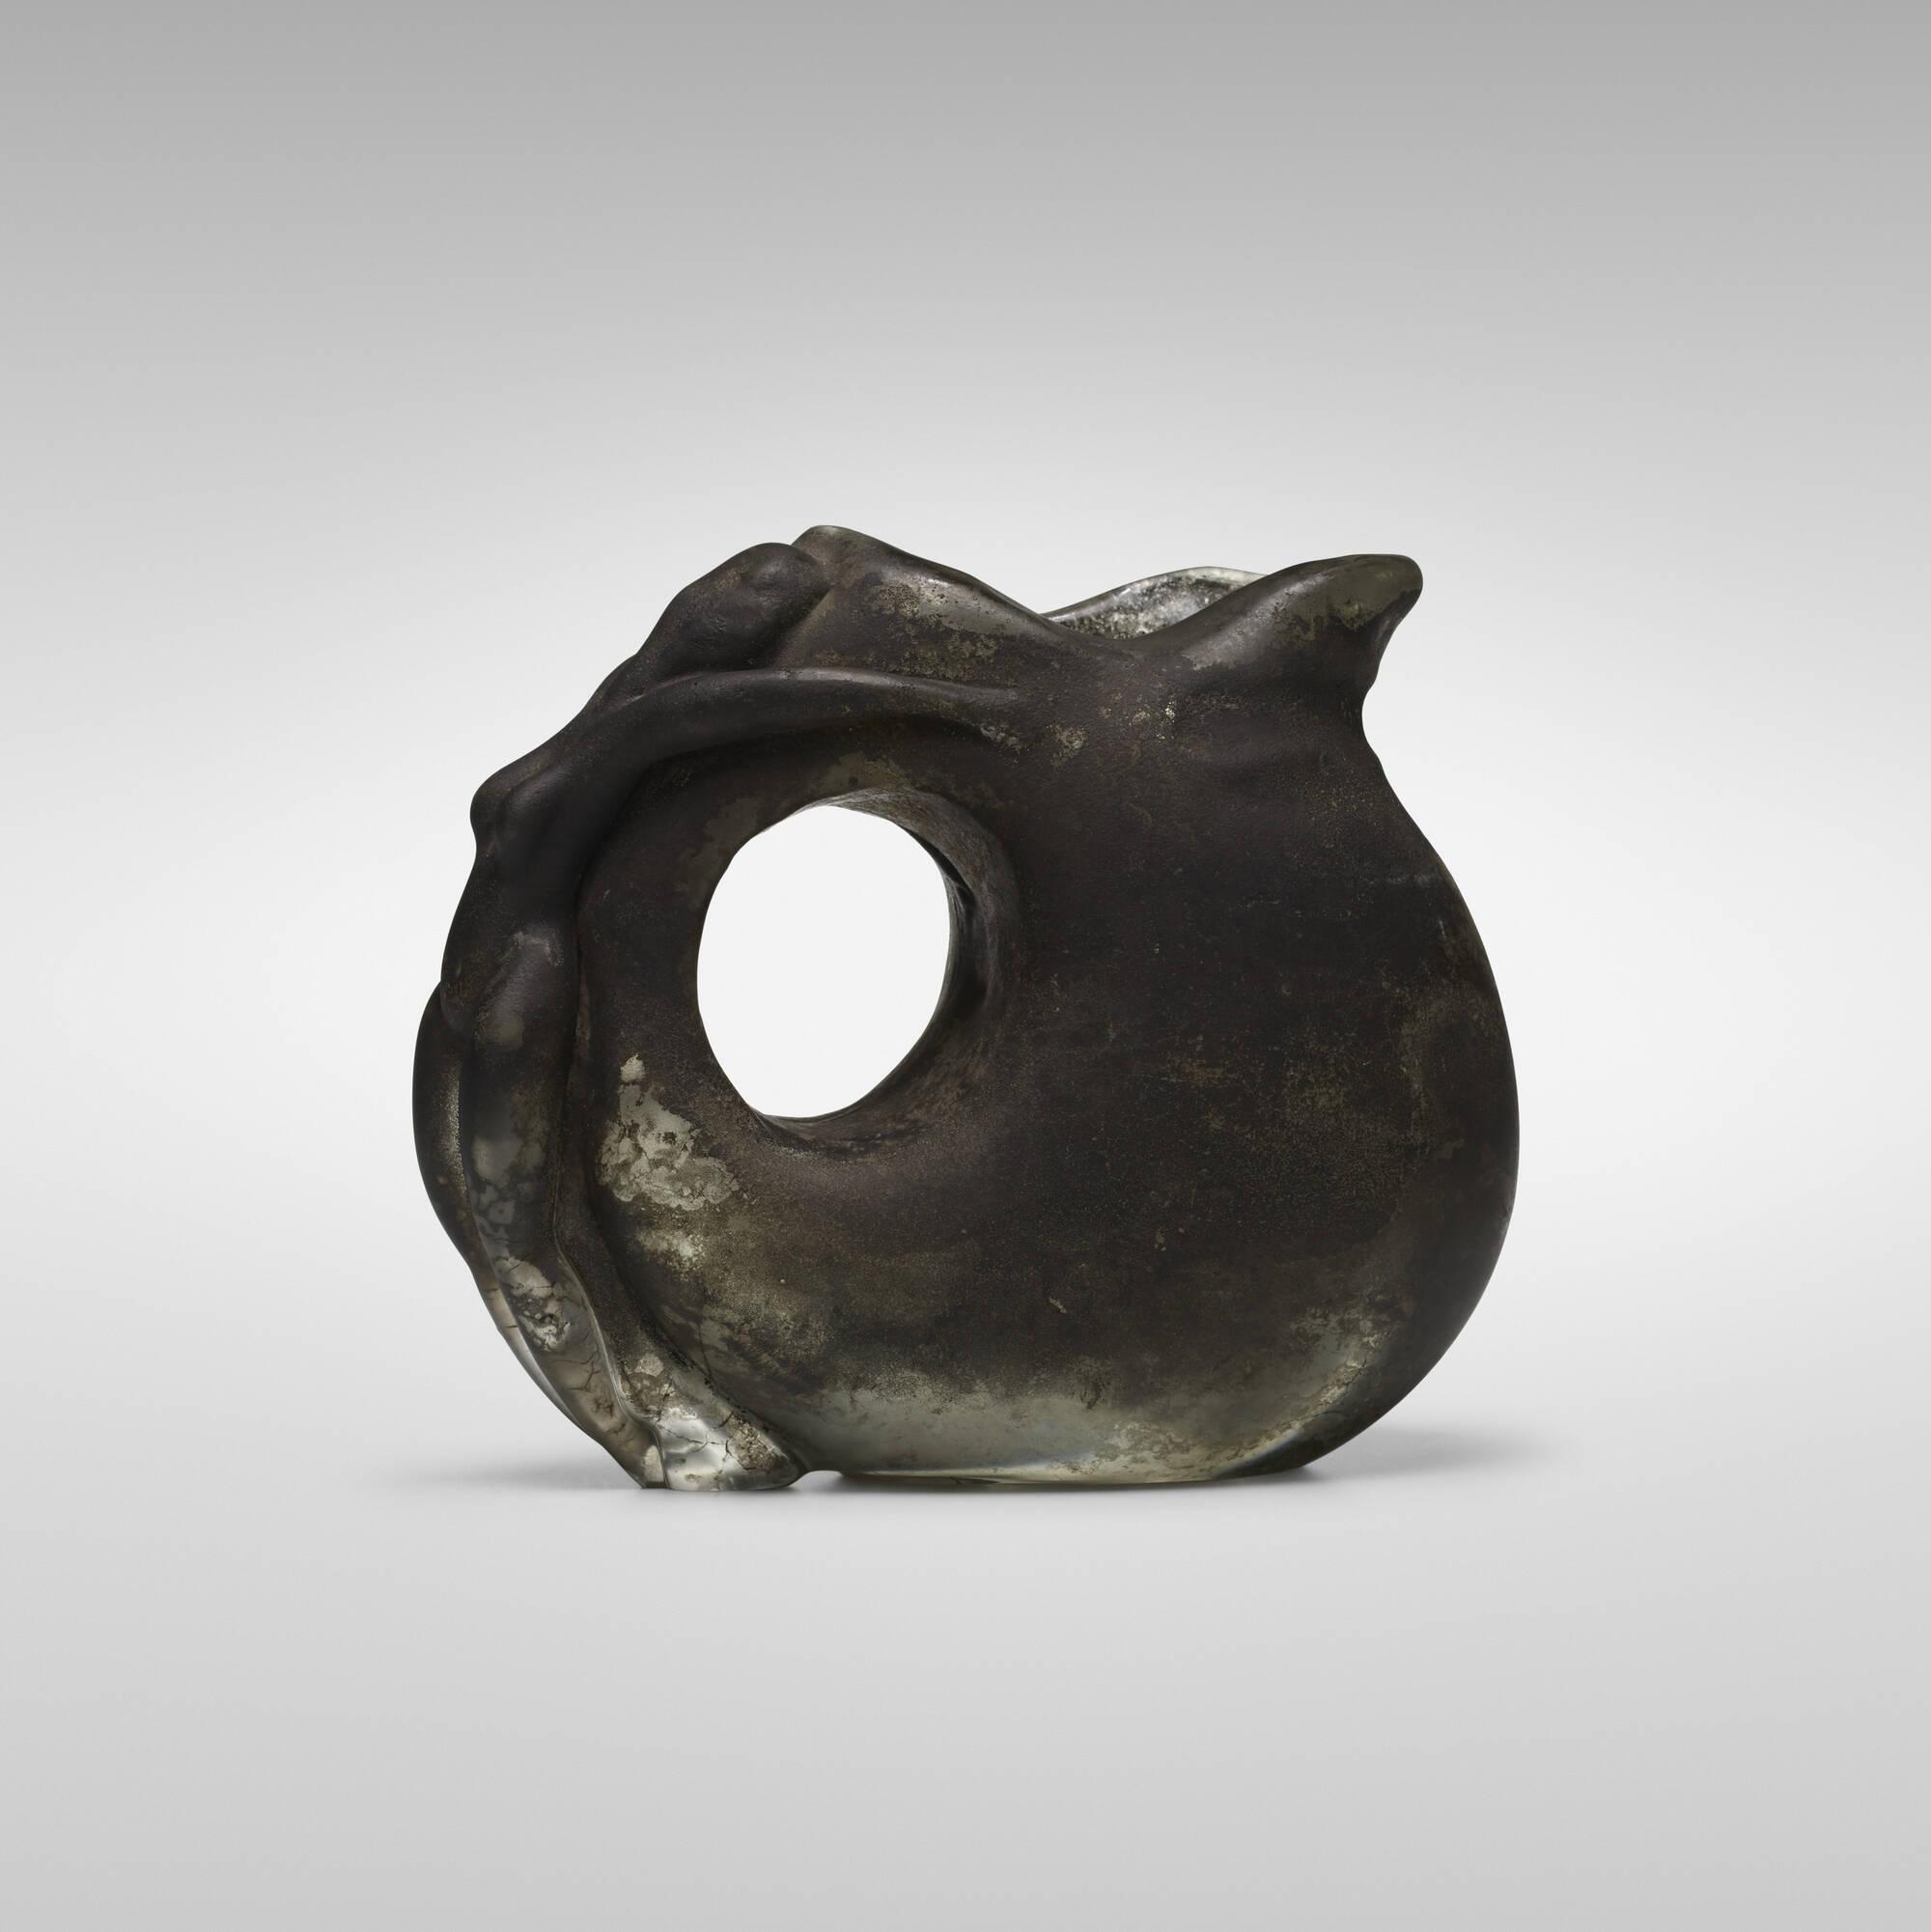 172: Ermanno Nason / vase with figural handle (1 of 3)